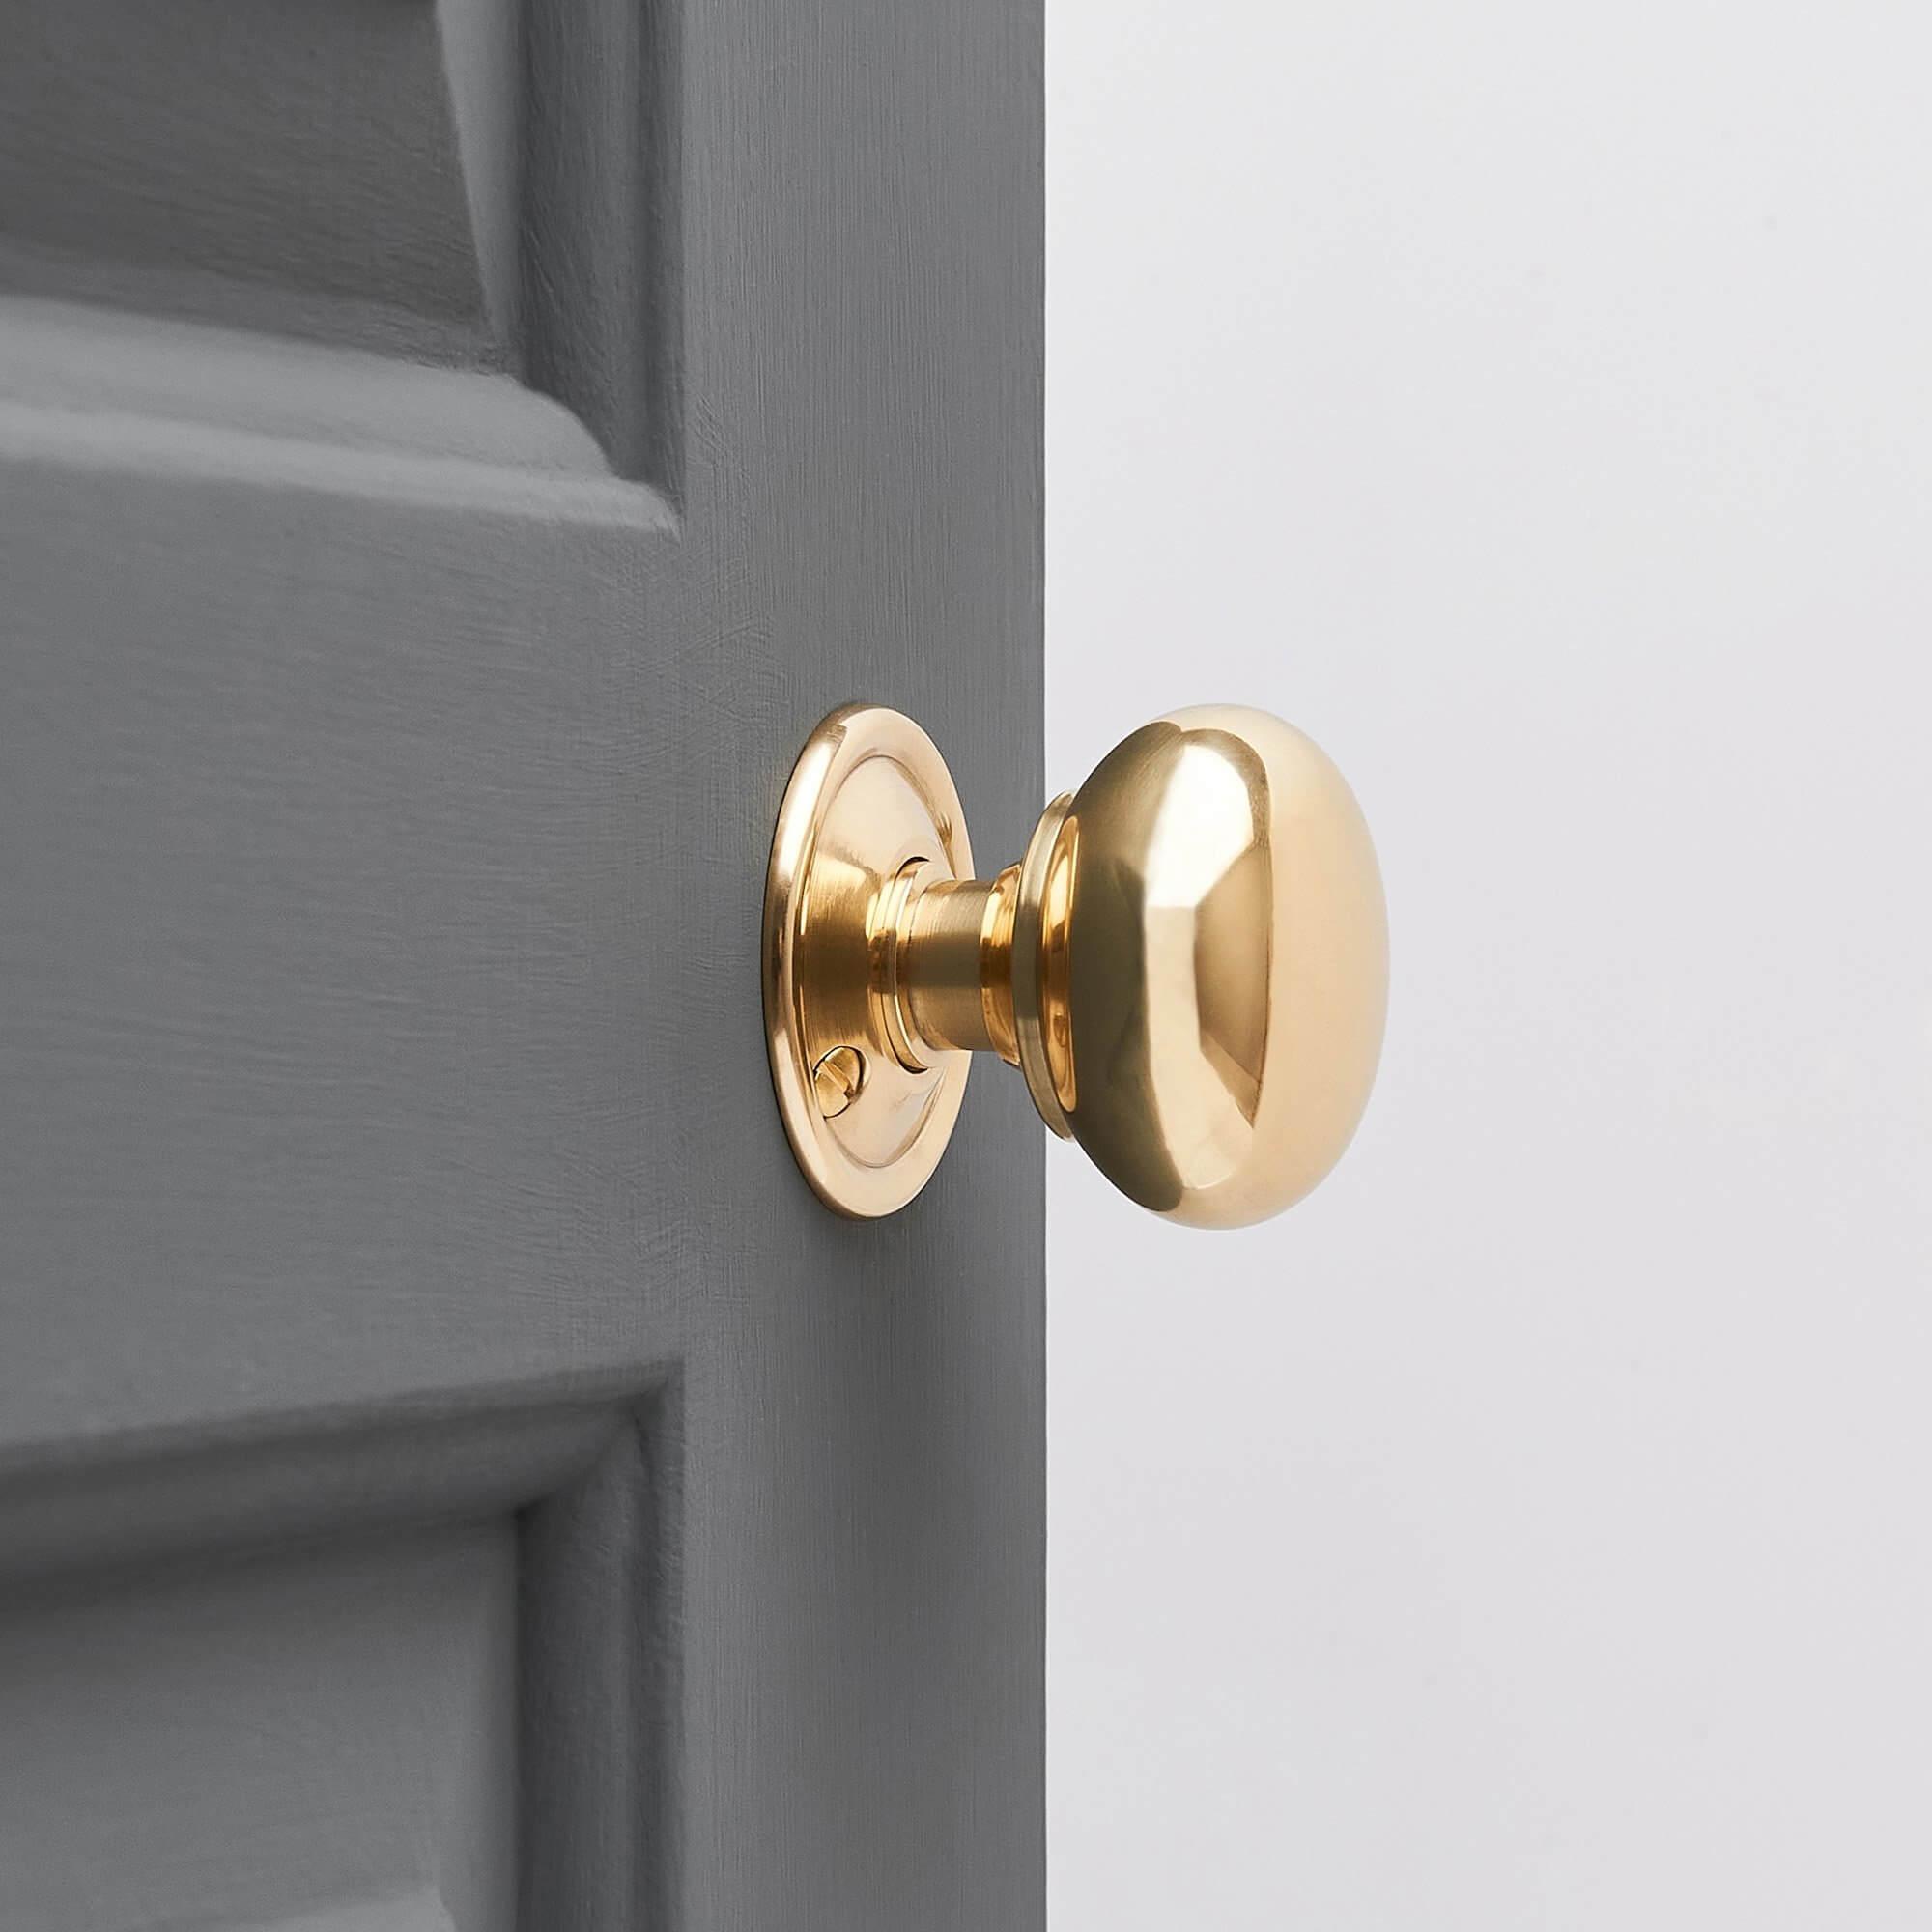 Cottage Door Knobs (Pair) - Brass